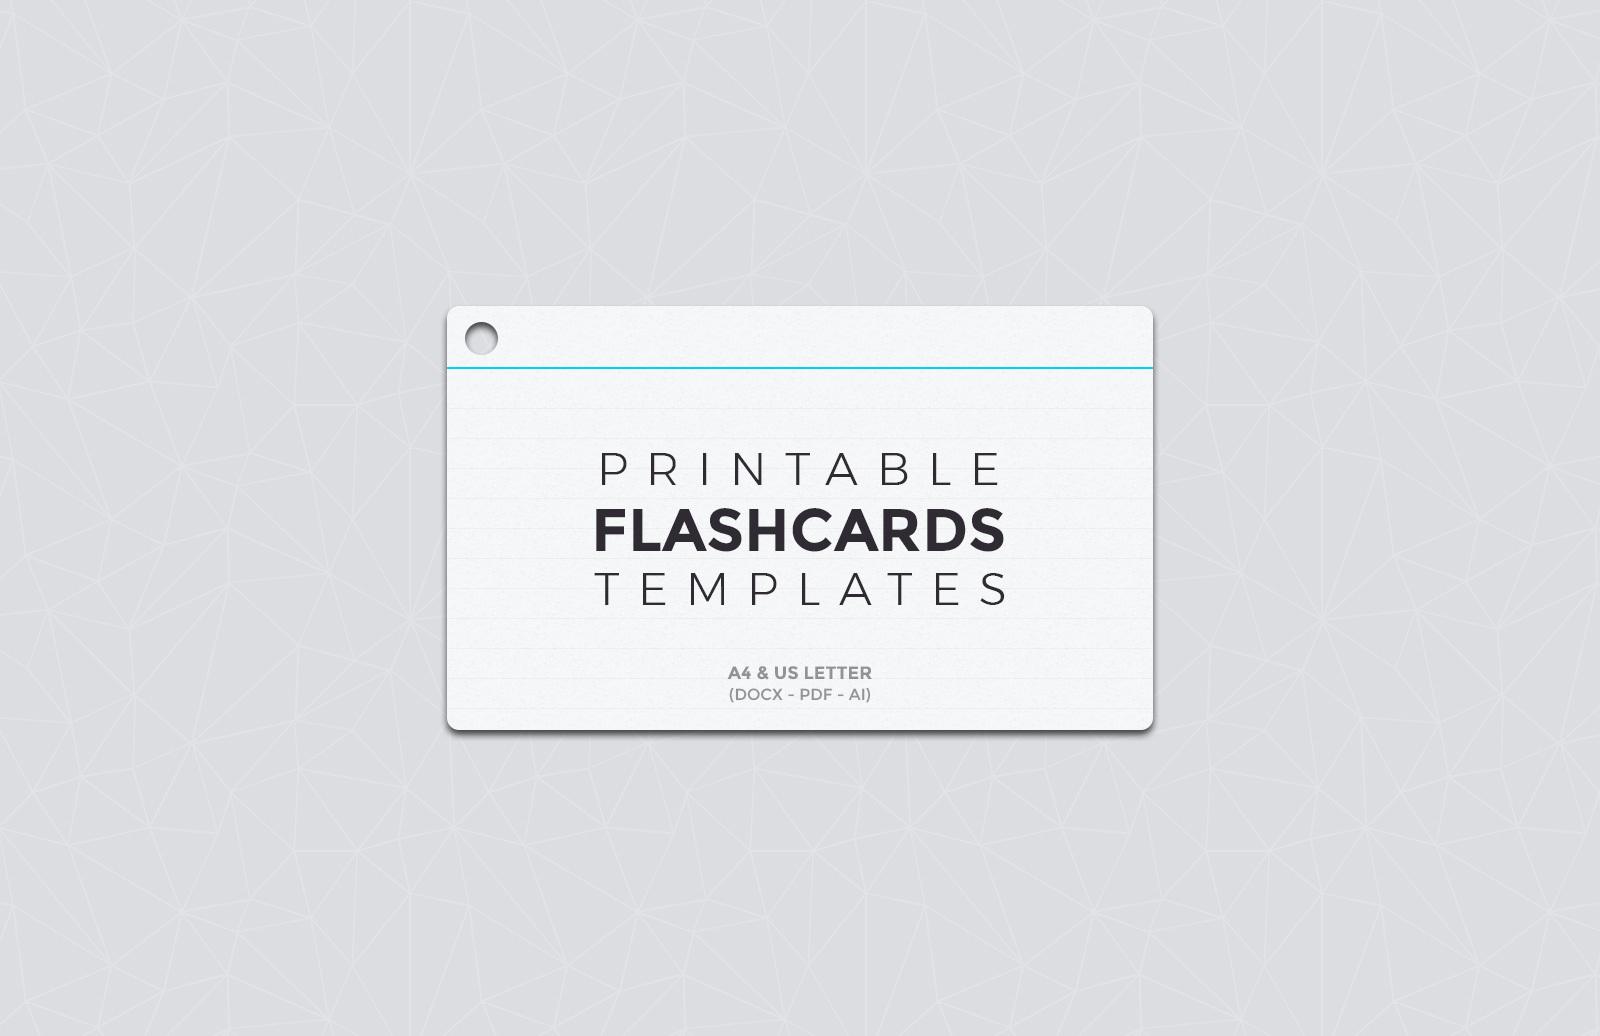 Free Printable Flashcard Templates